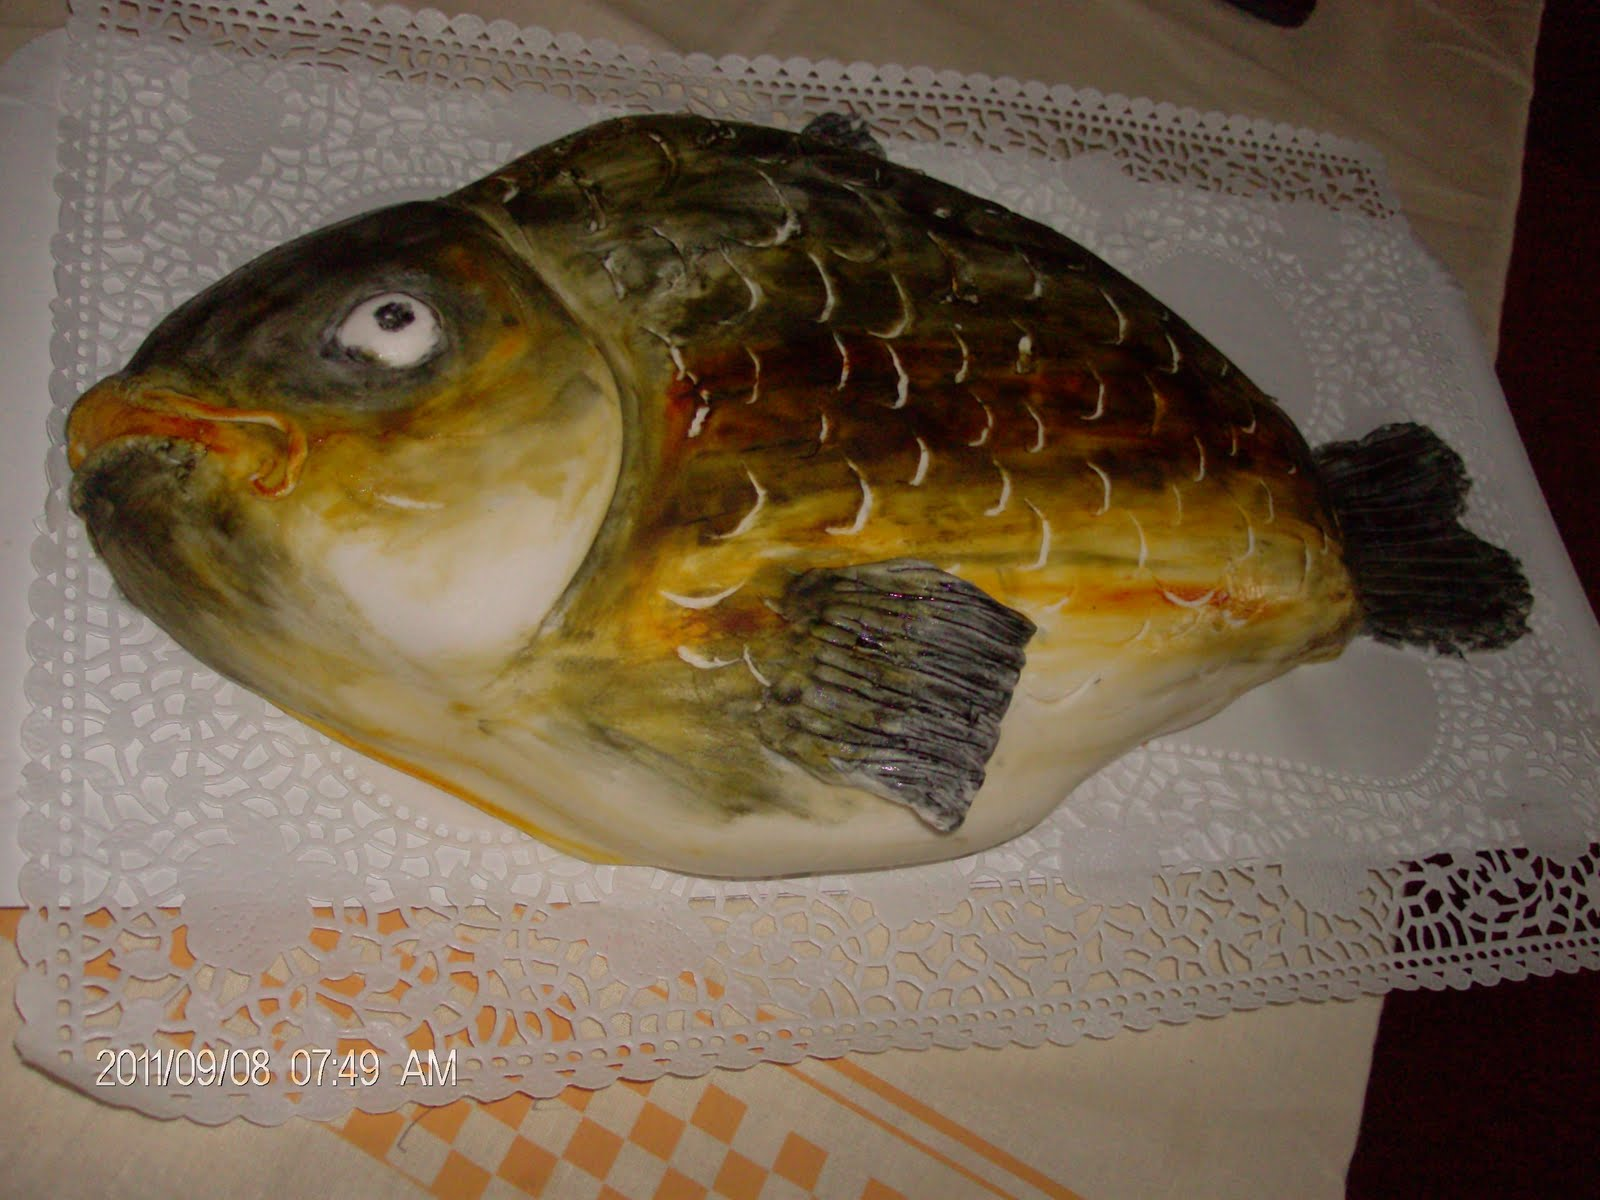 hal alakú torta képek Gigi kreatív műhely: ponty torta hal alakú torta képek